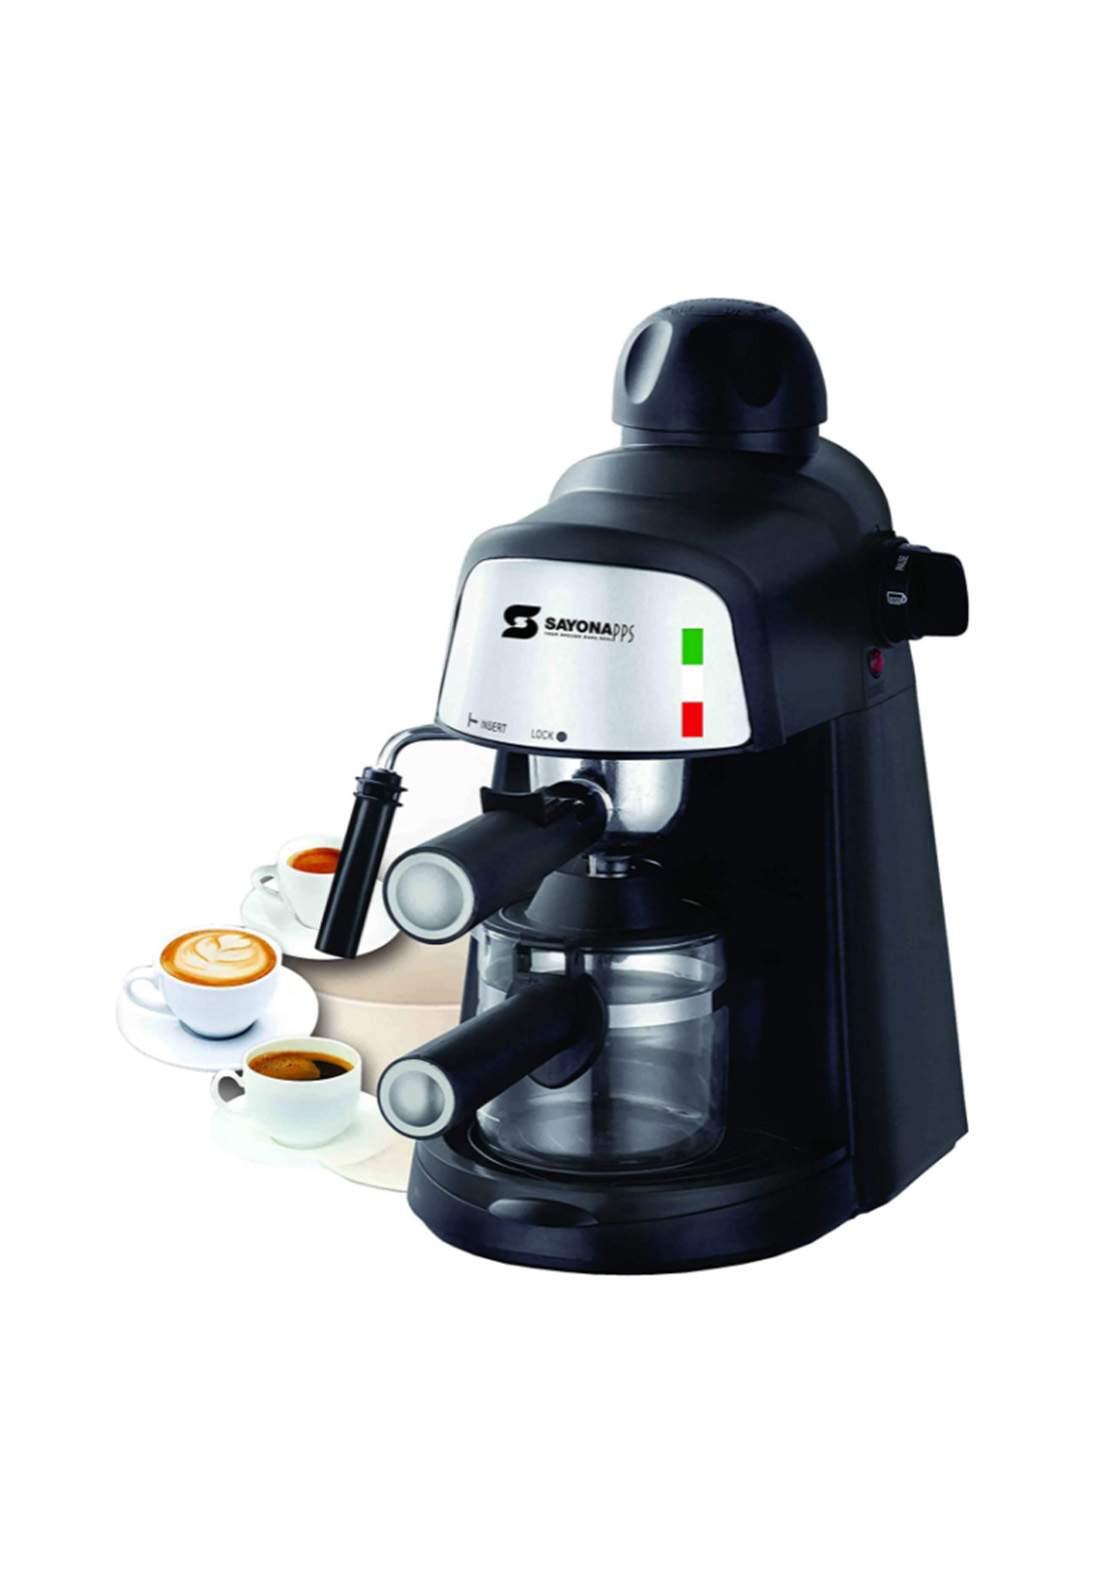 Sayona 4298  Coffee Machine 800 Watt ماكنة صنع قهوة